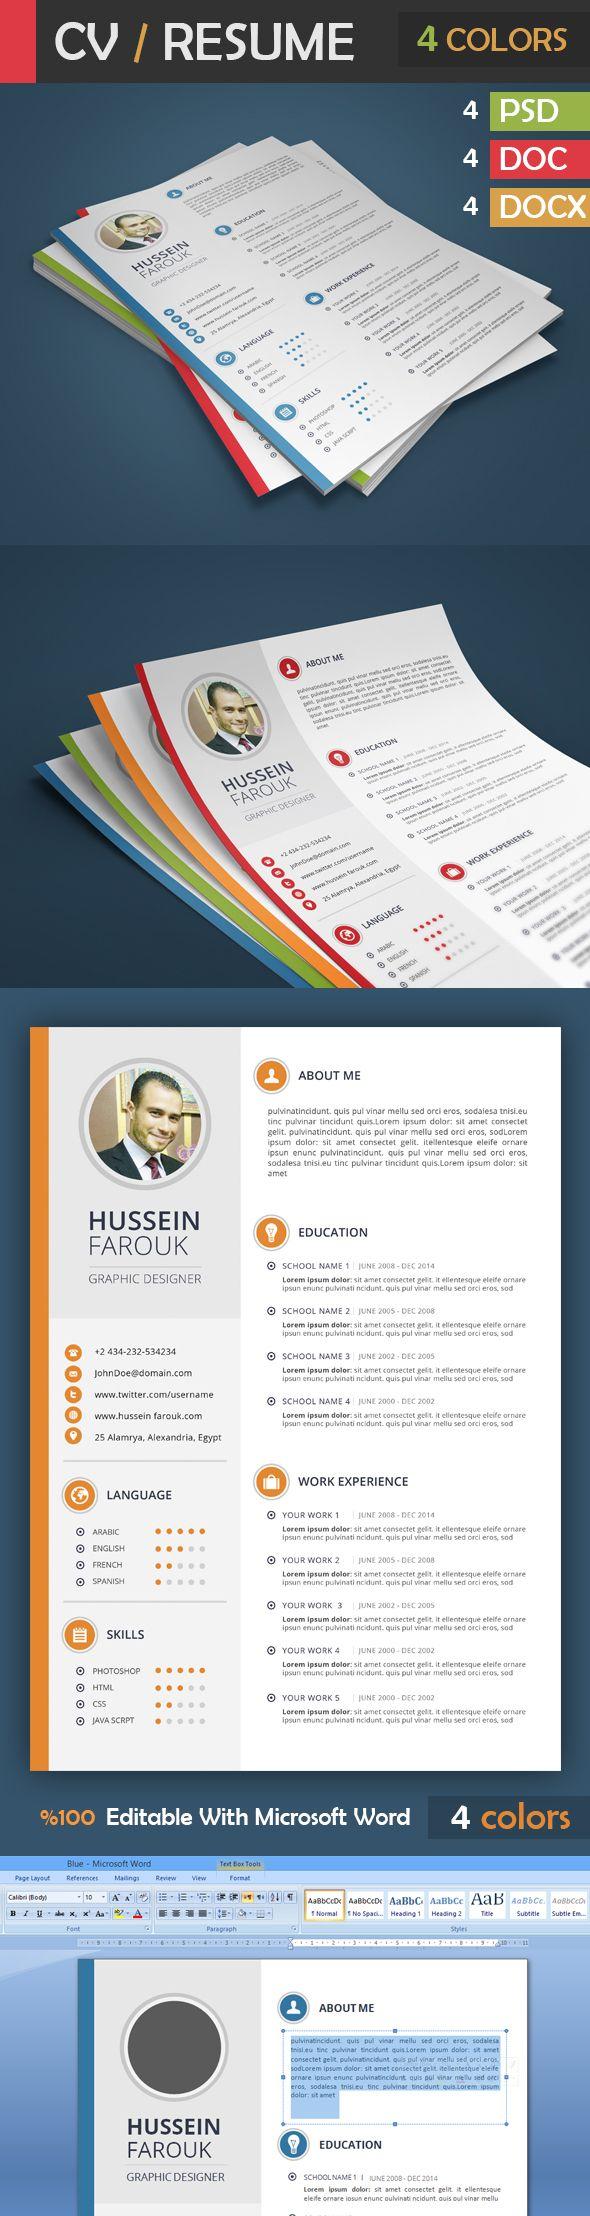 Resume on Behance 9 best images